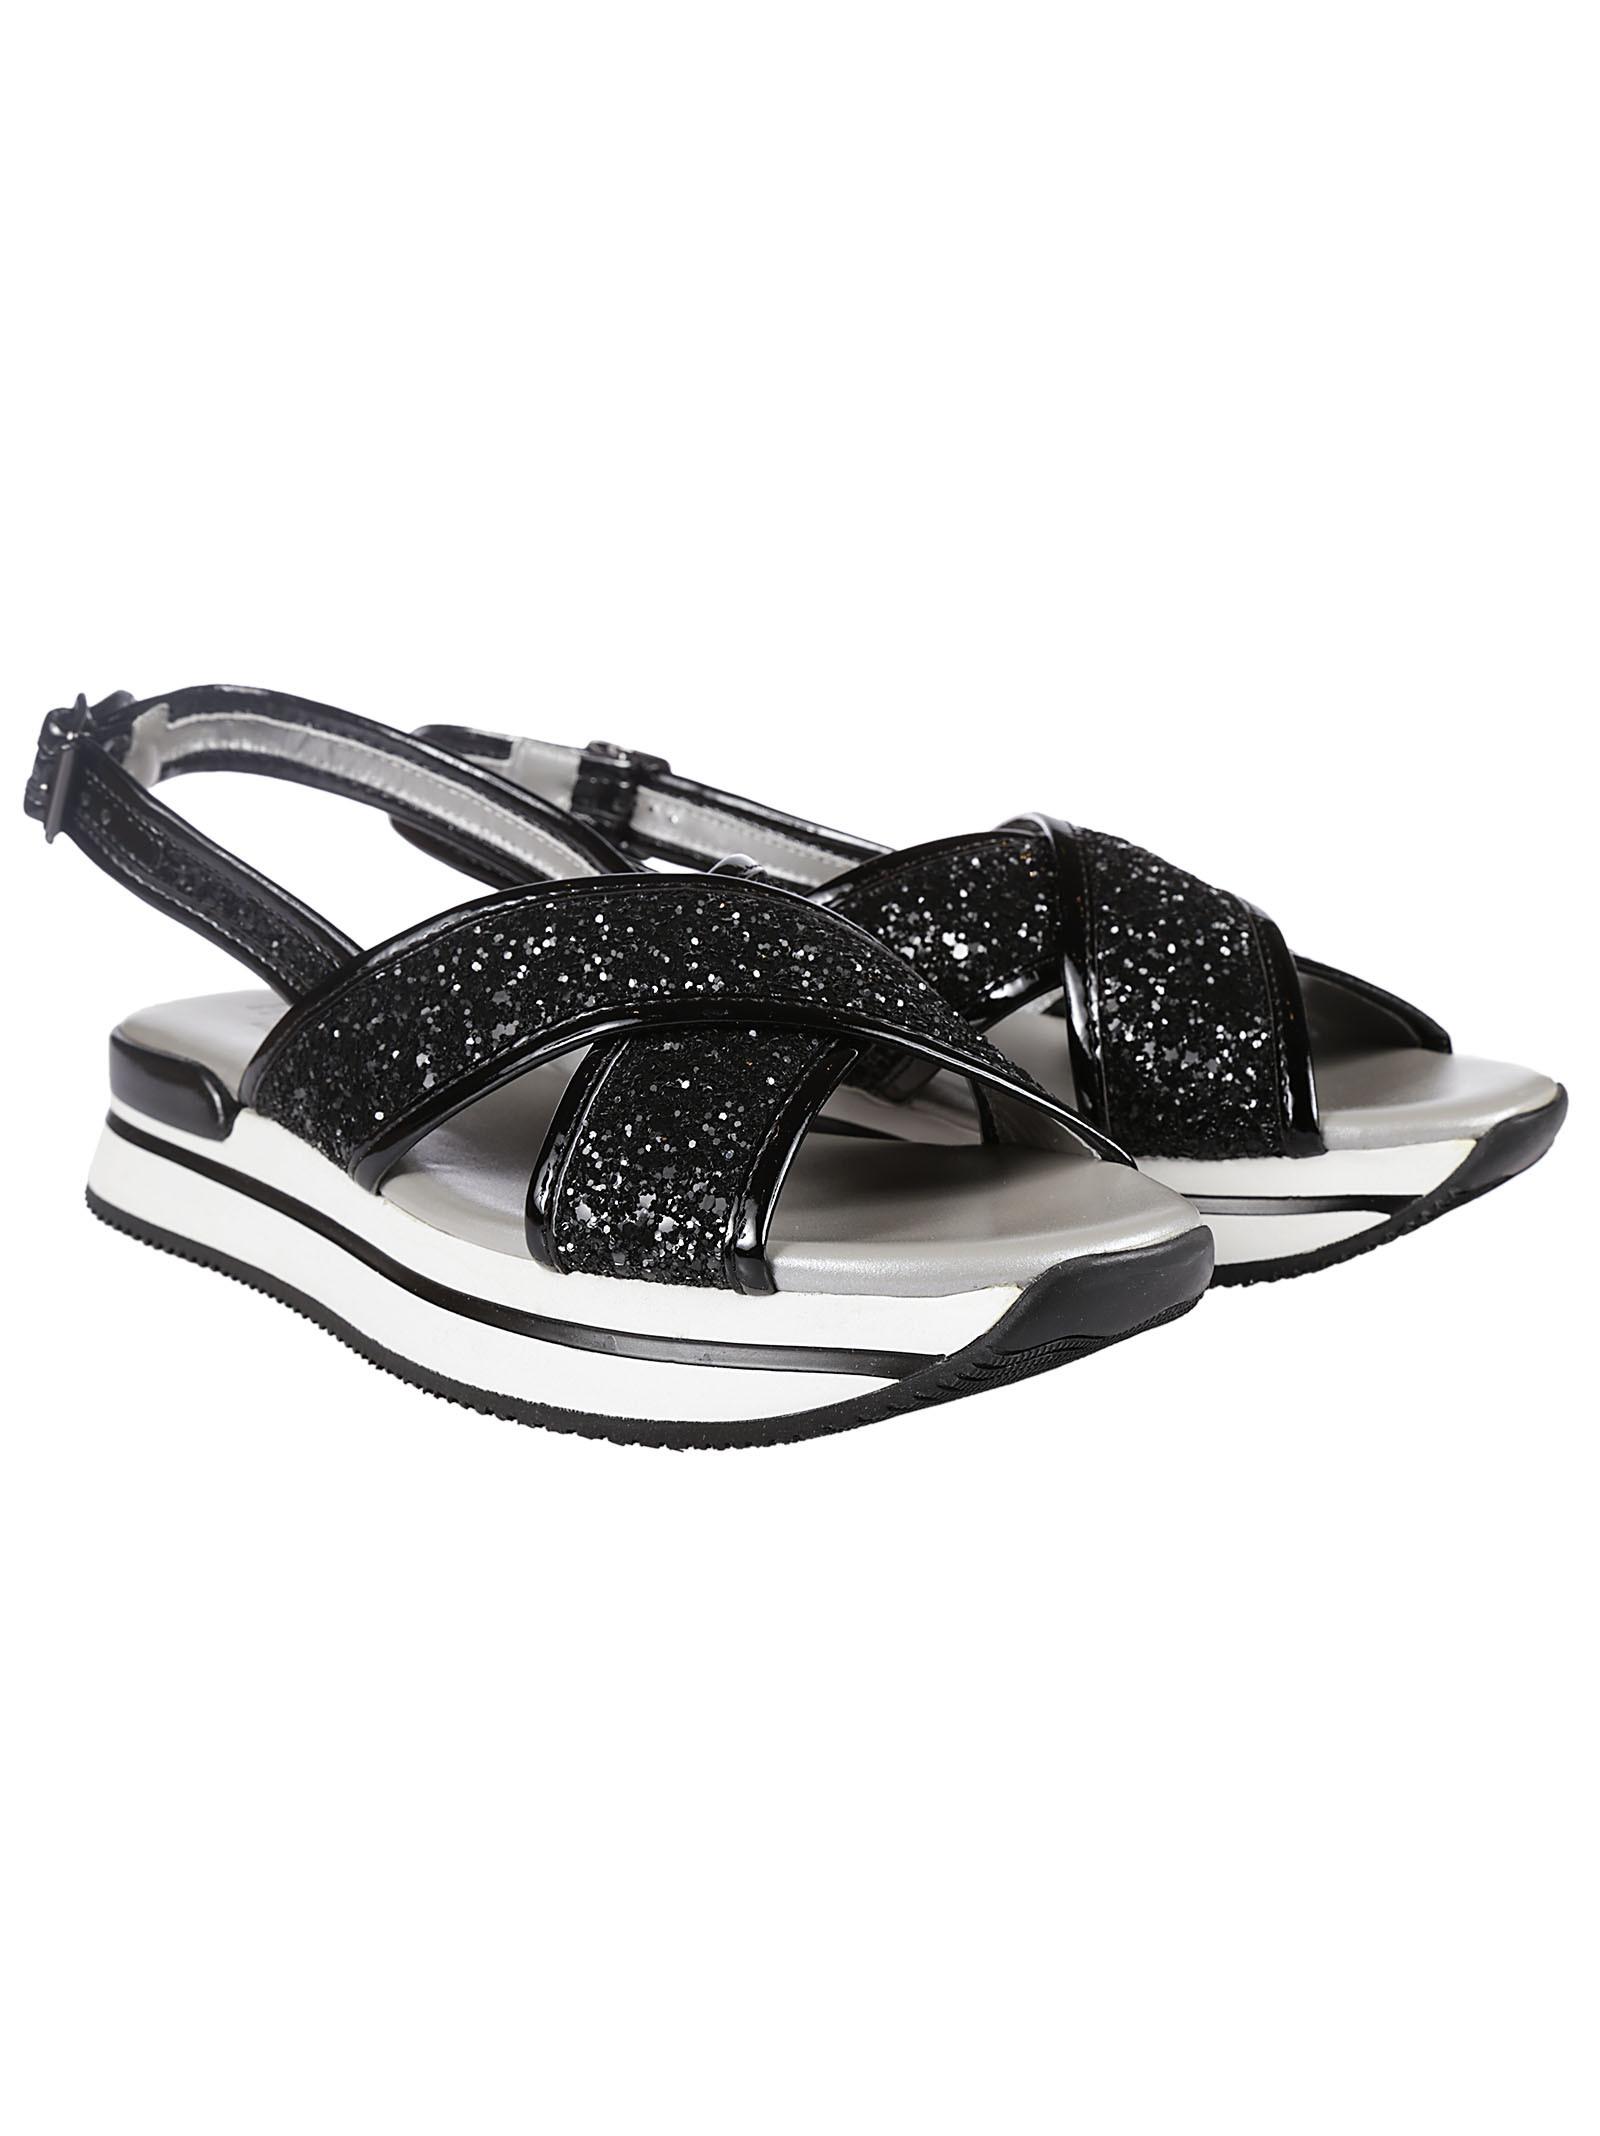 glitter crisscross wedge sandals in black lyst